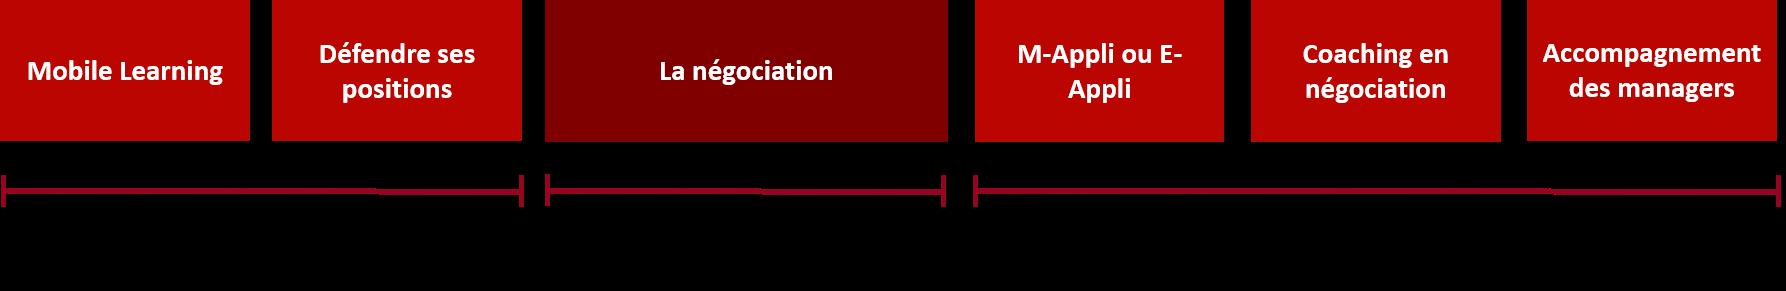 formation-negociation